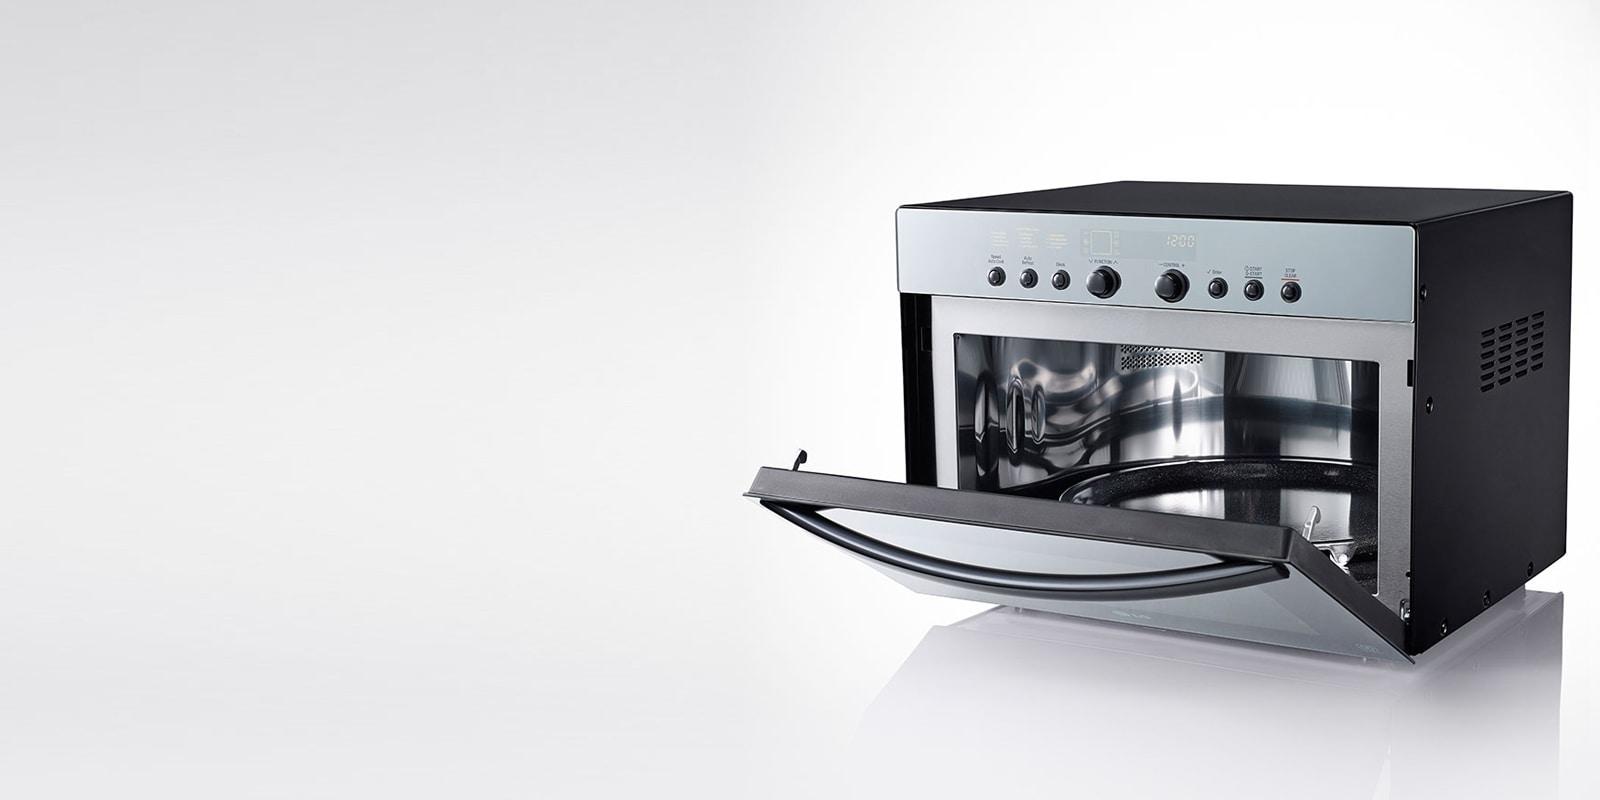 Kitchen Small Appliances Australia - Lightwave ovens